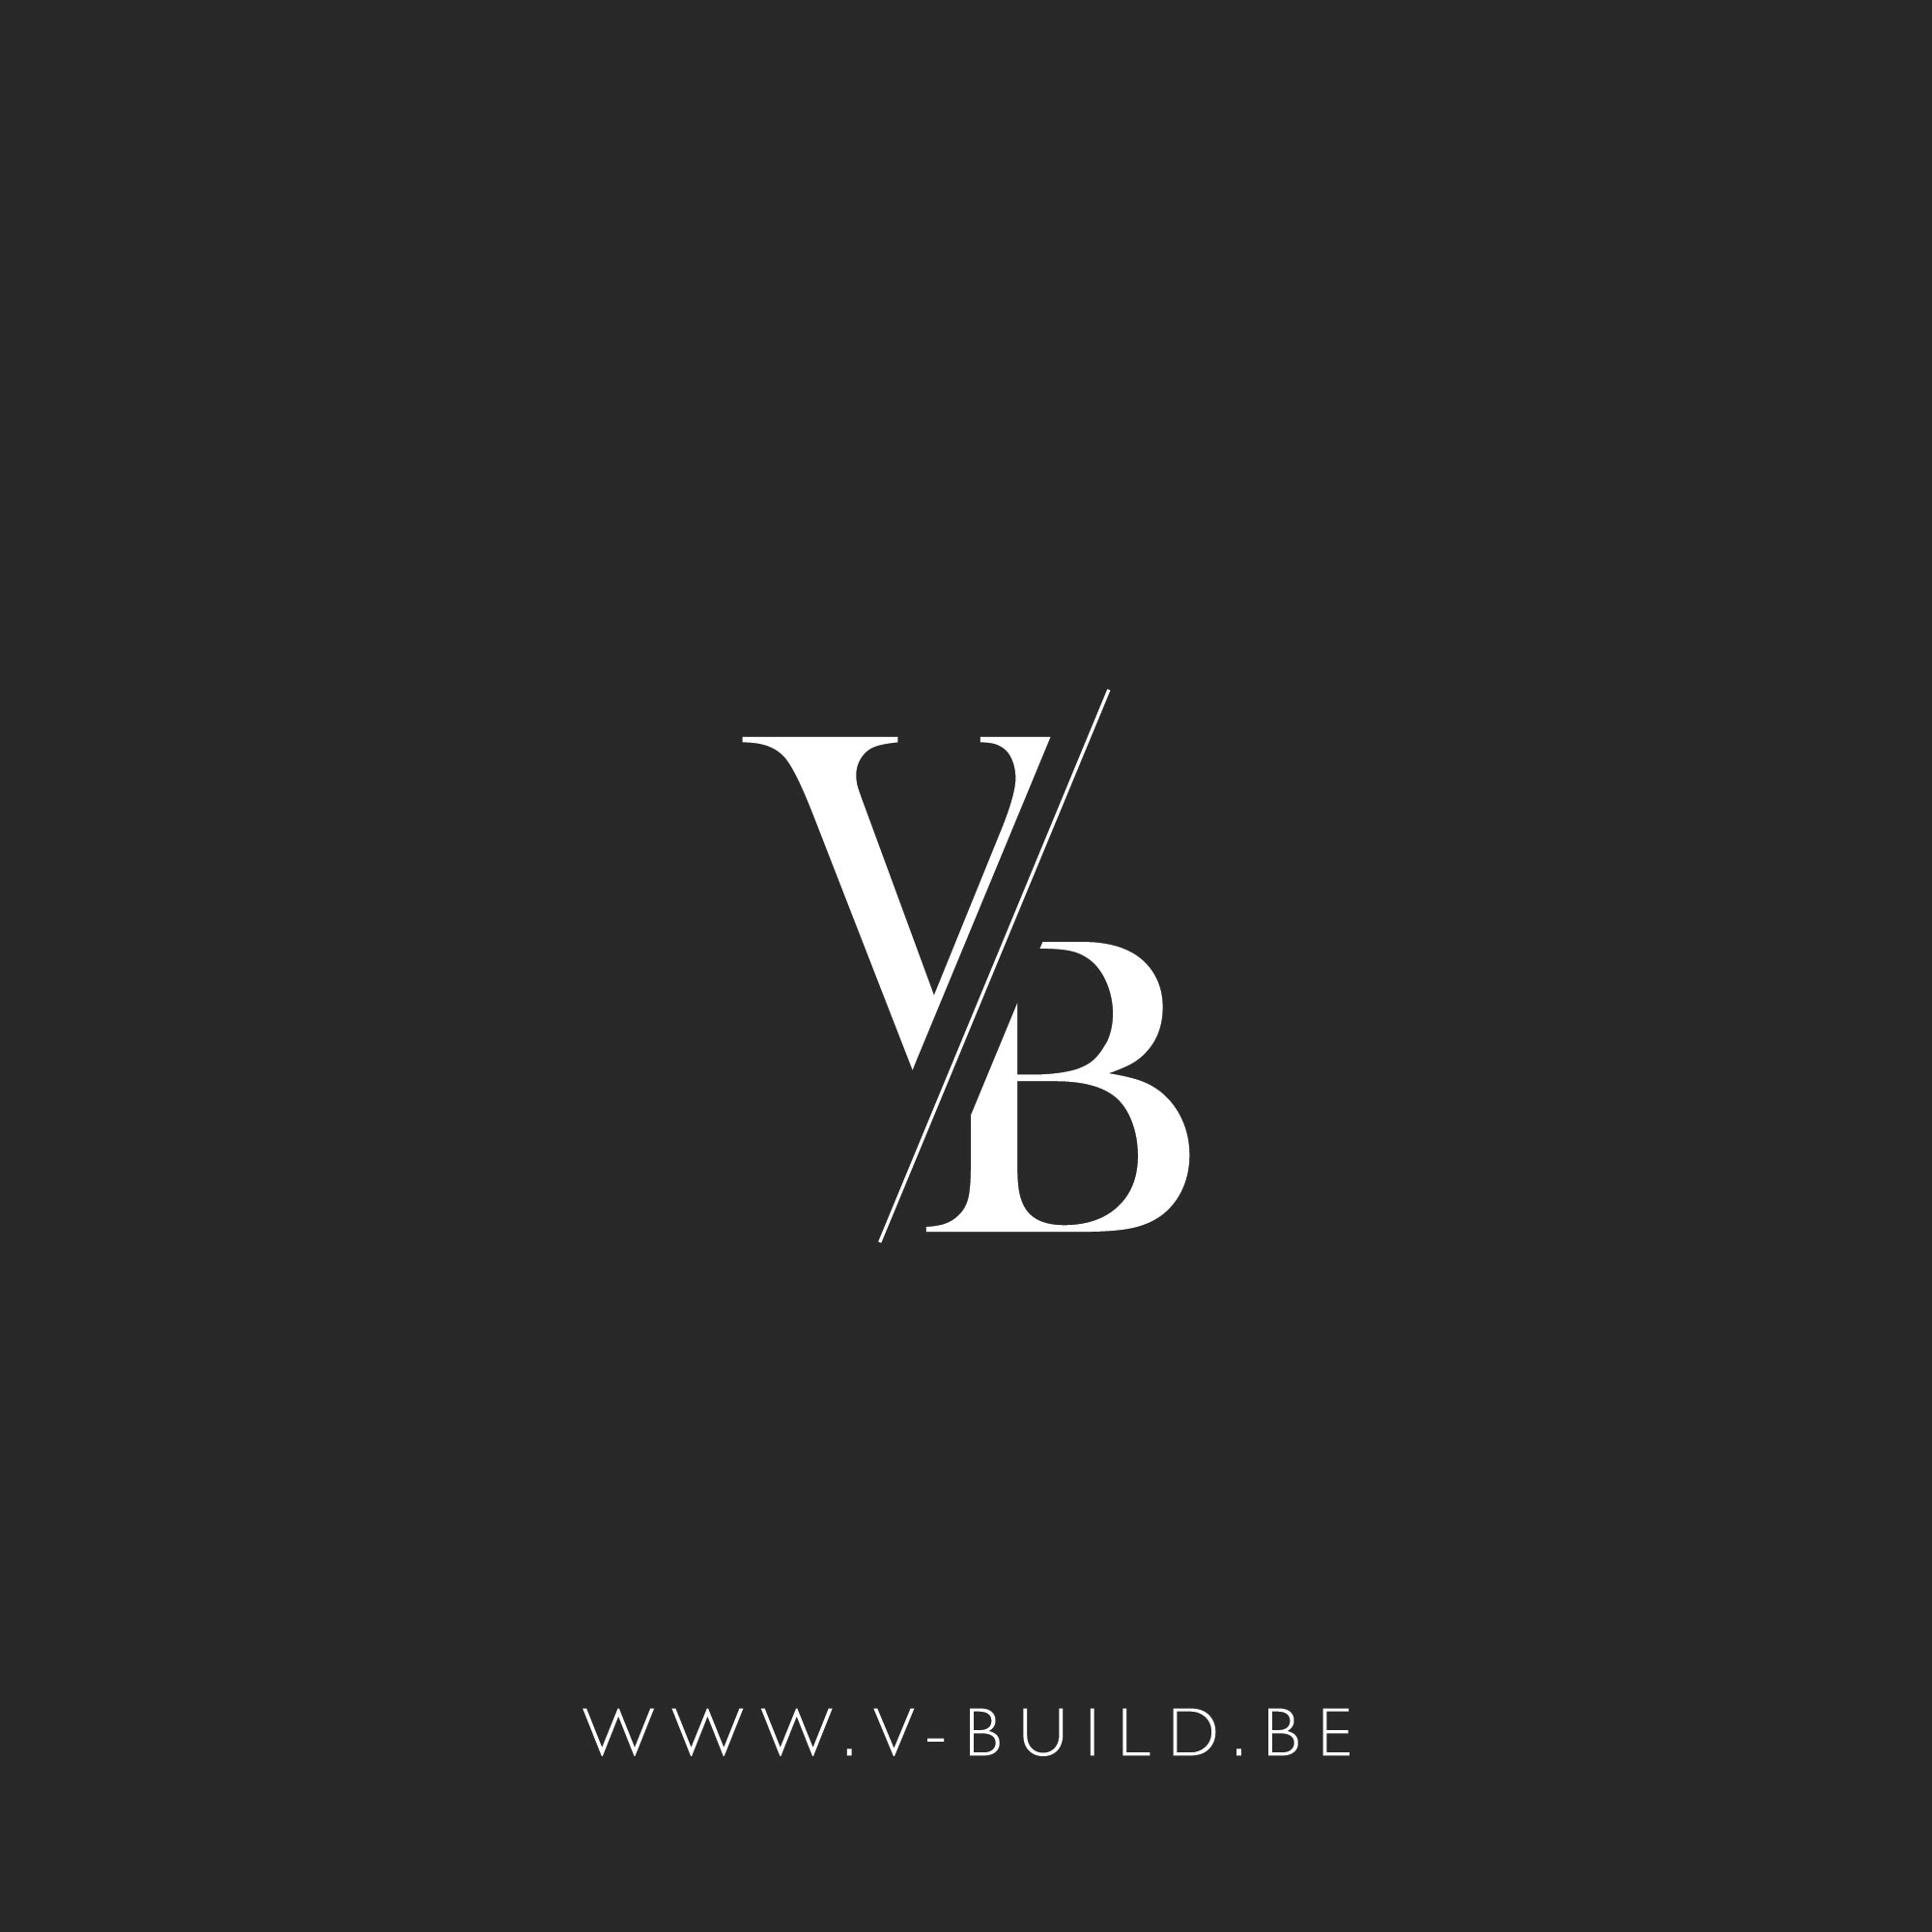 https://sconcept.be/wp-content/uploads/2020/08/v-build-5.jpg